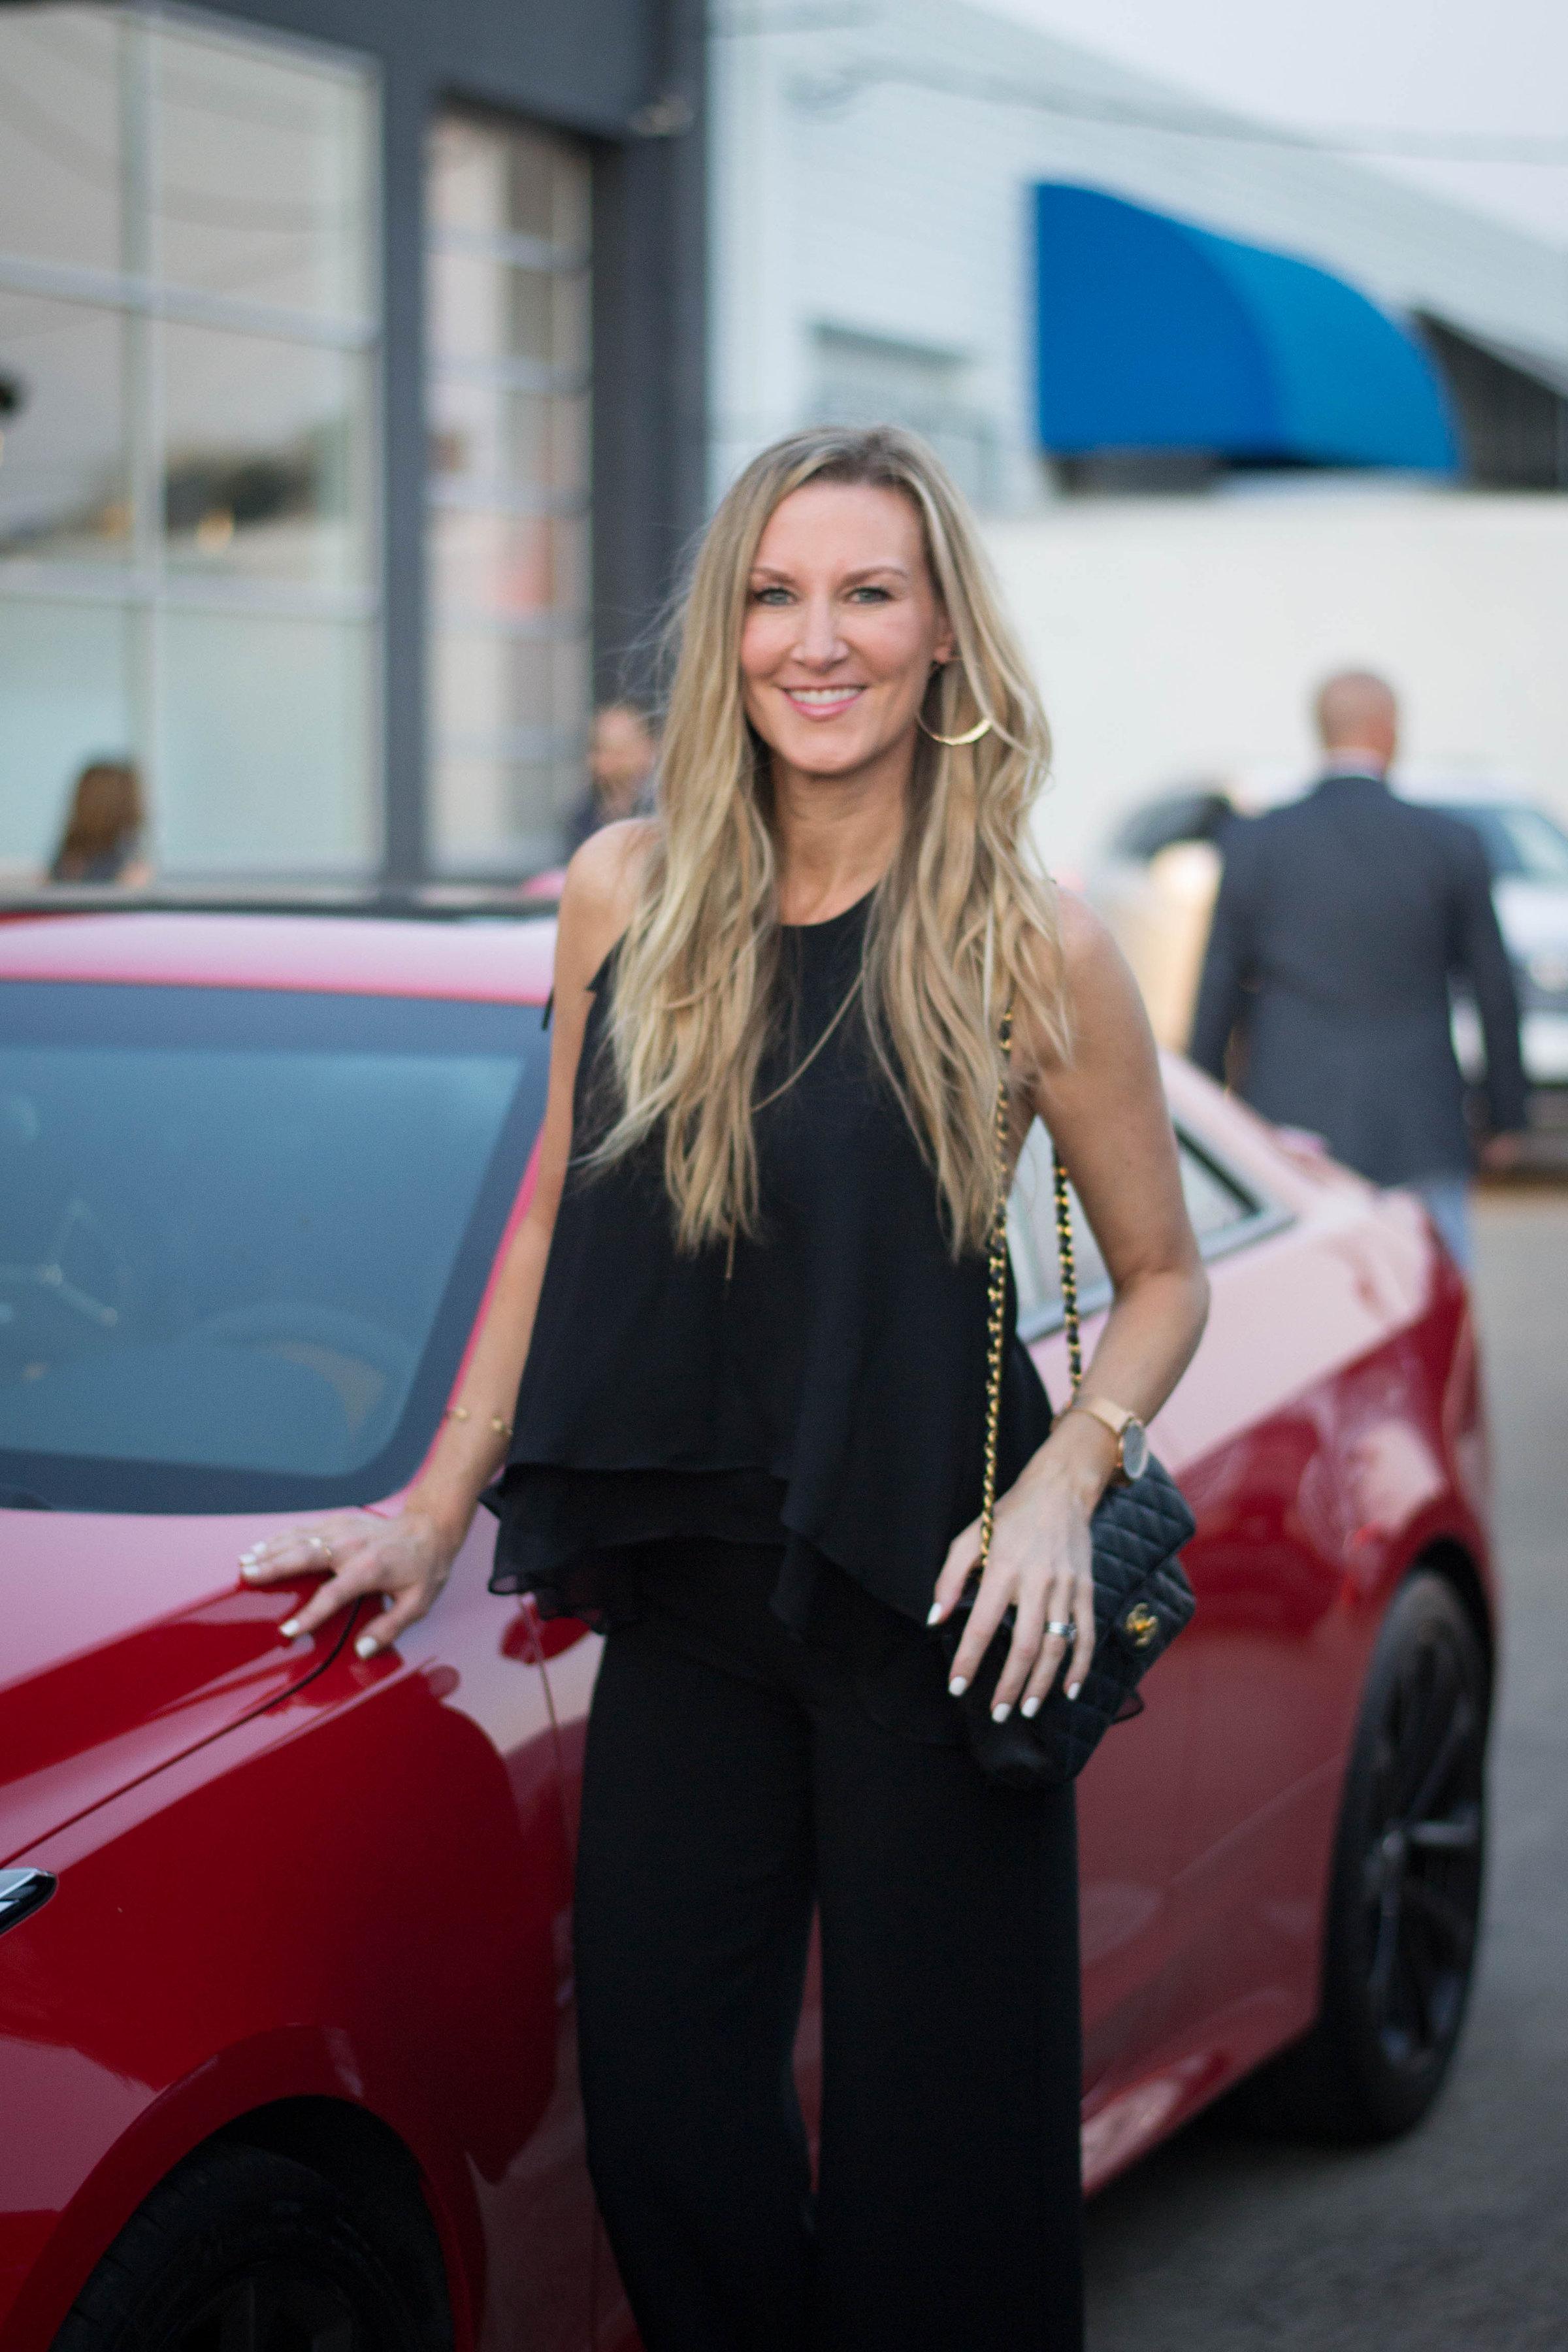 Cadillac-smile-close